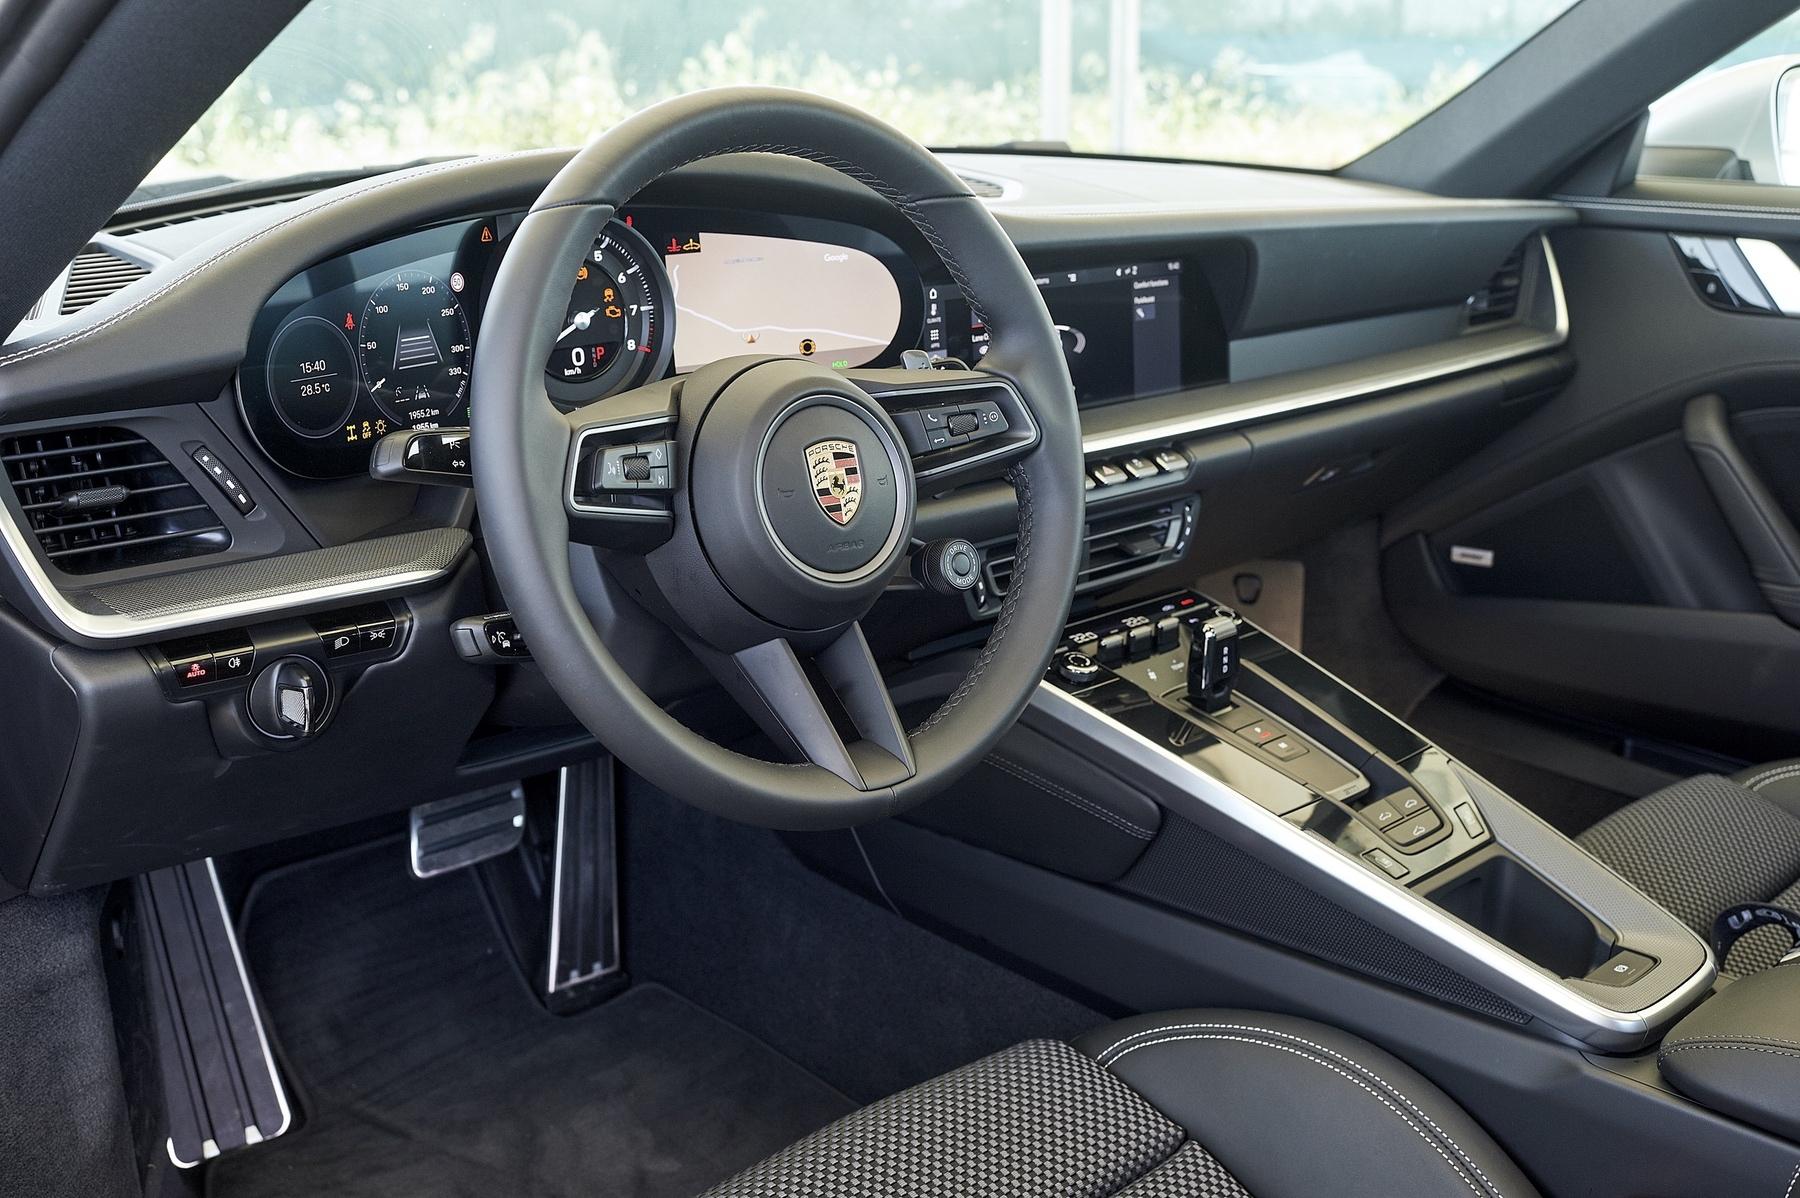 Test_Drive_Porsche_911_Athens_0198